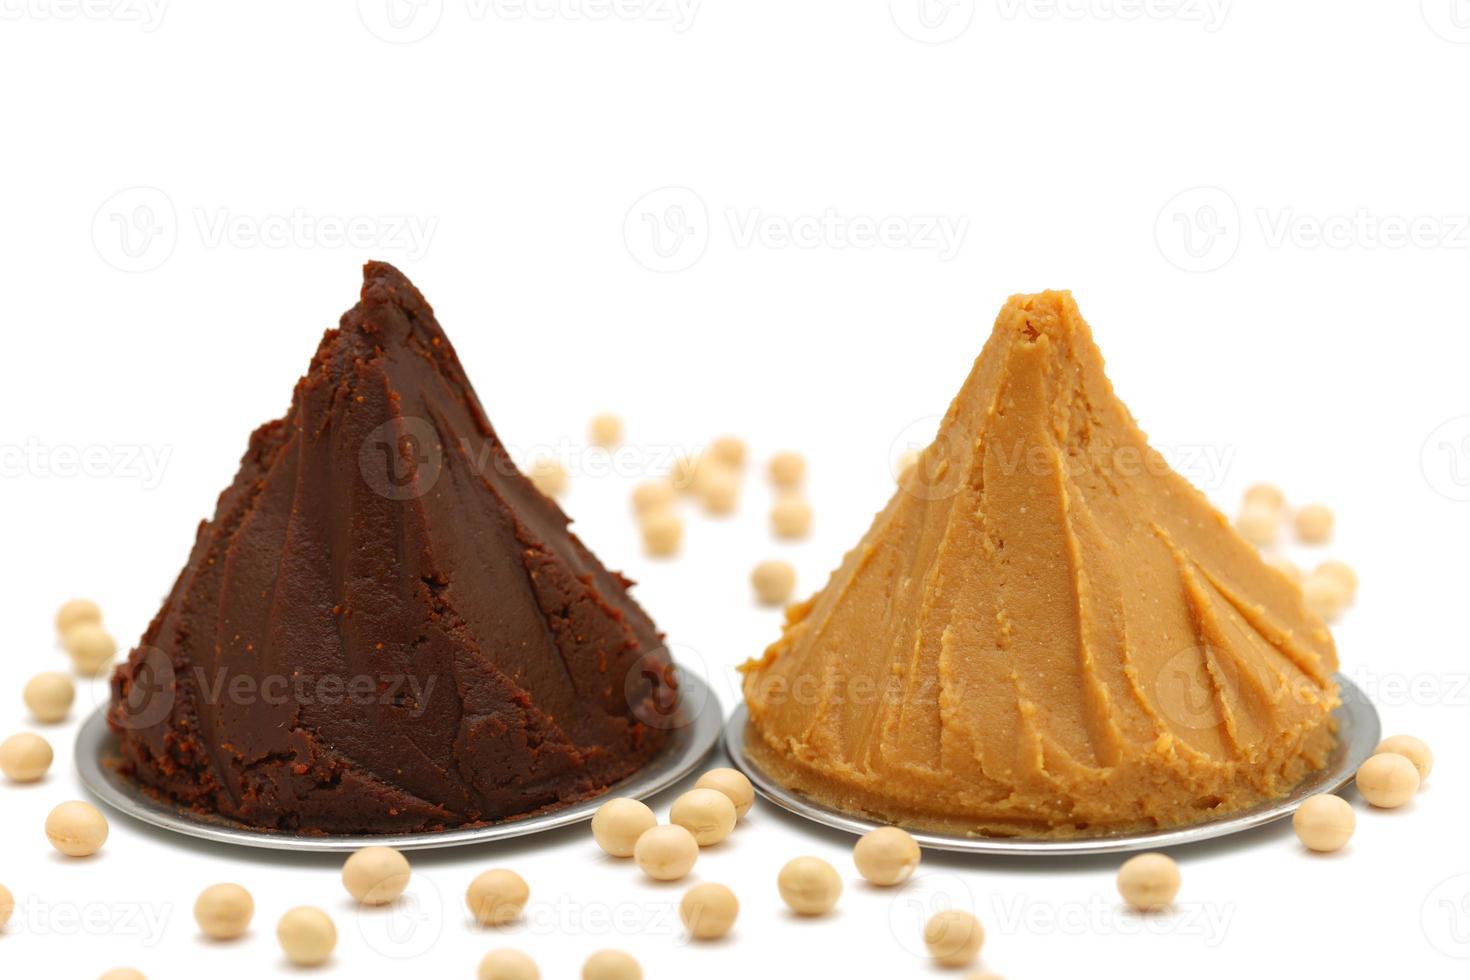 Sojabohnen verarbeitete Lebensmittel foto